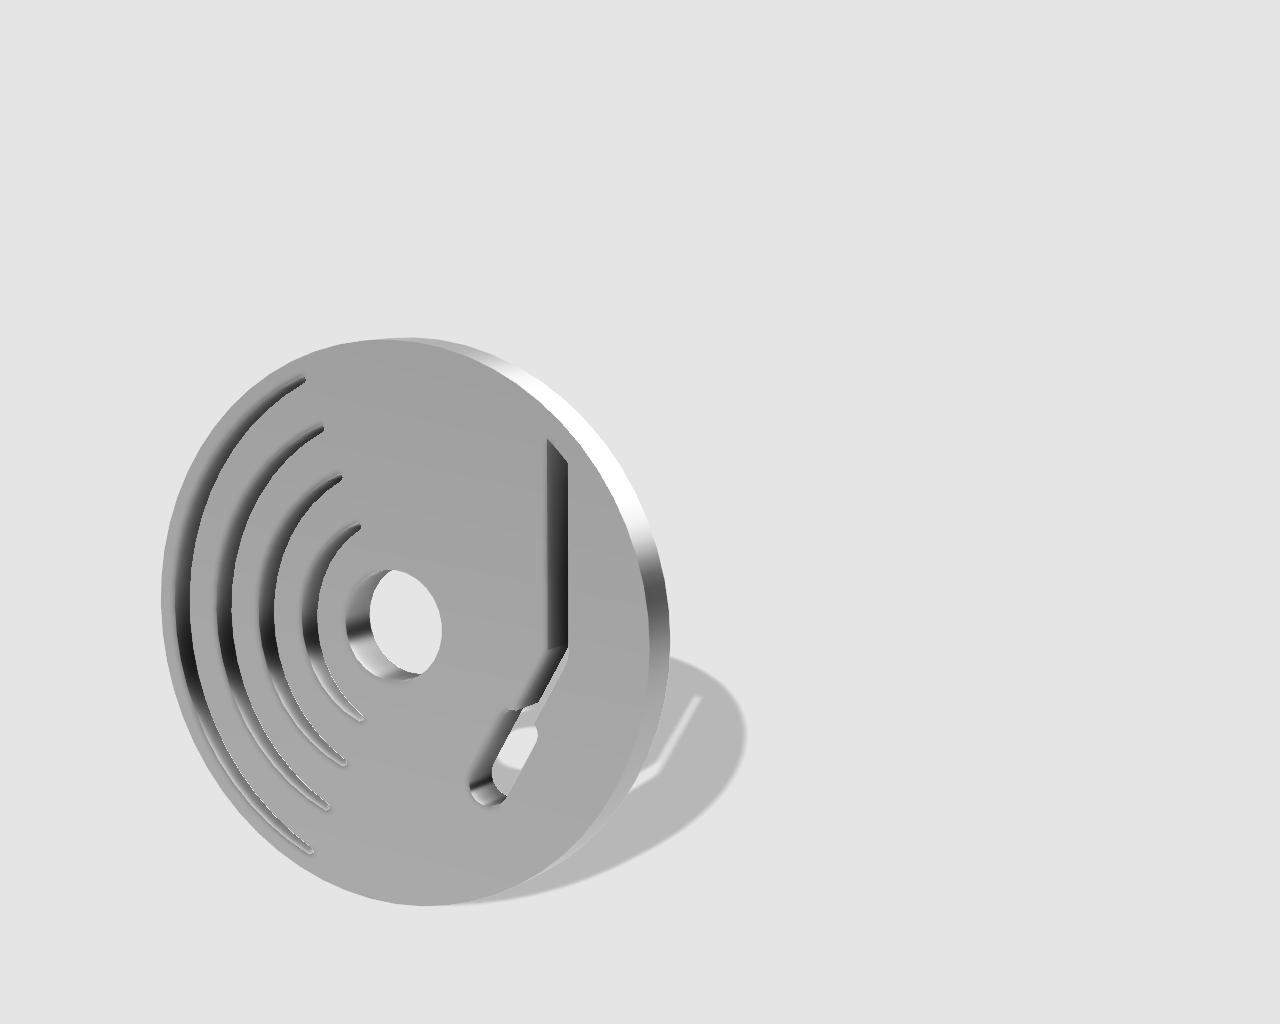 45rpm adaptor - turntable